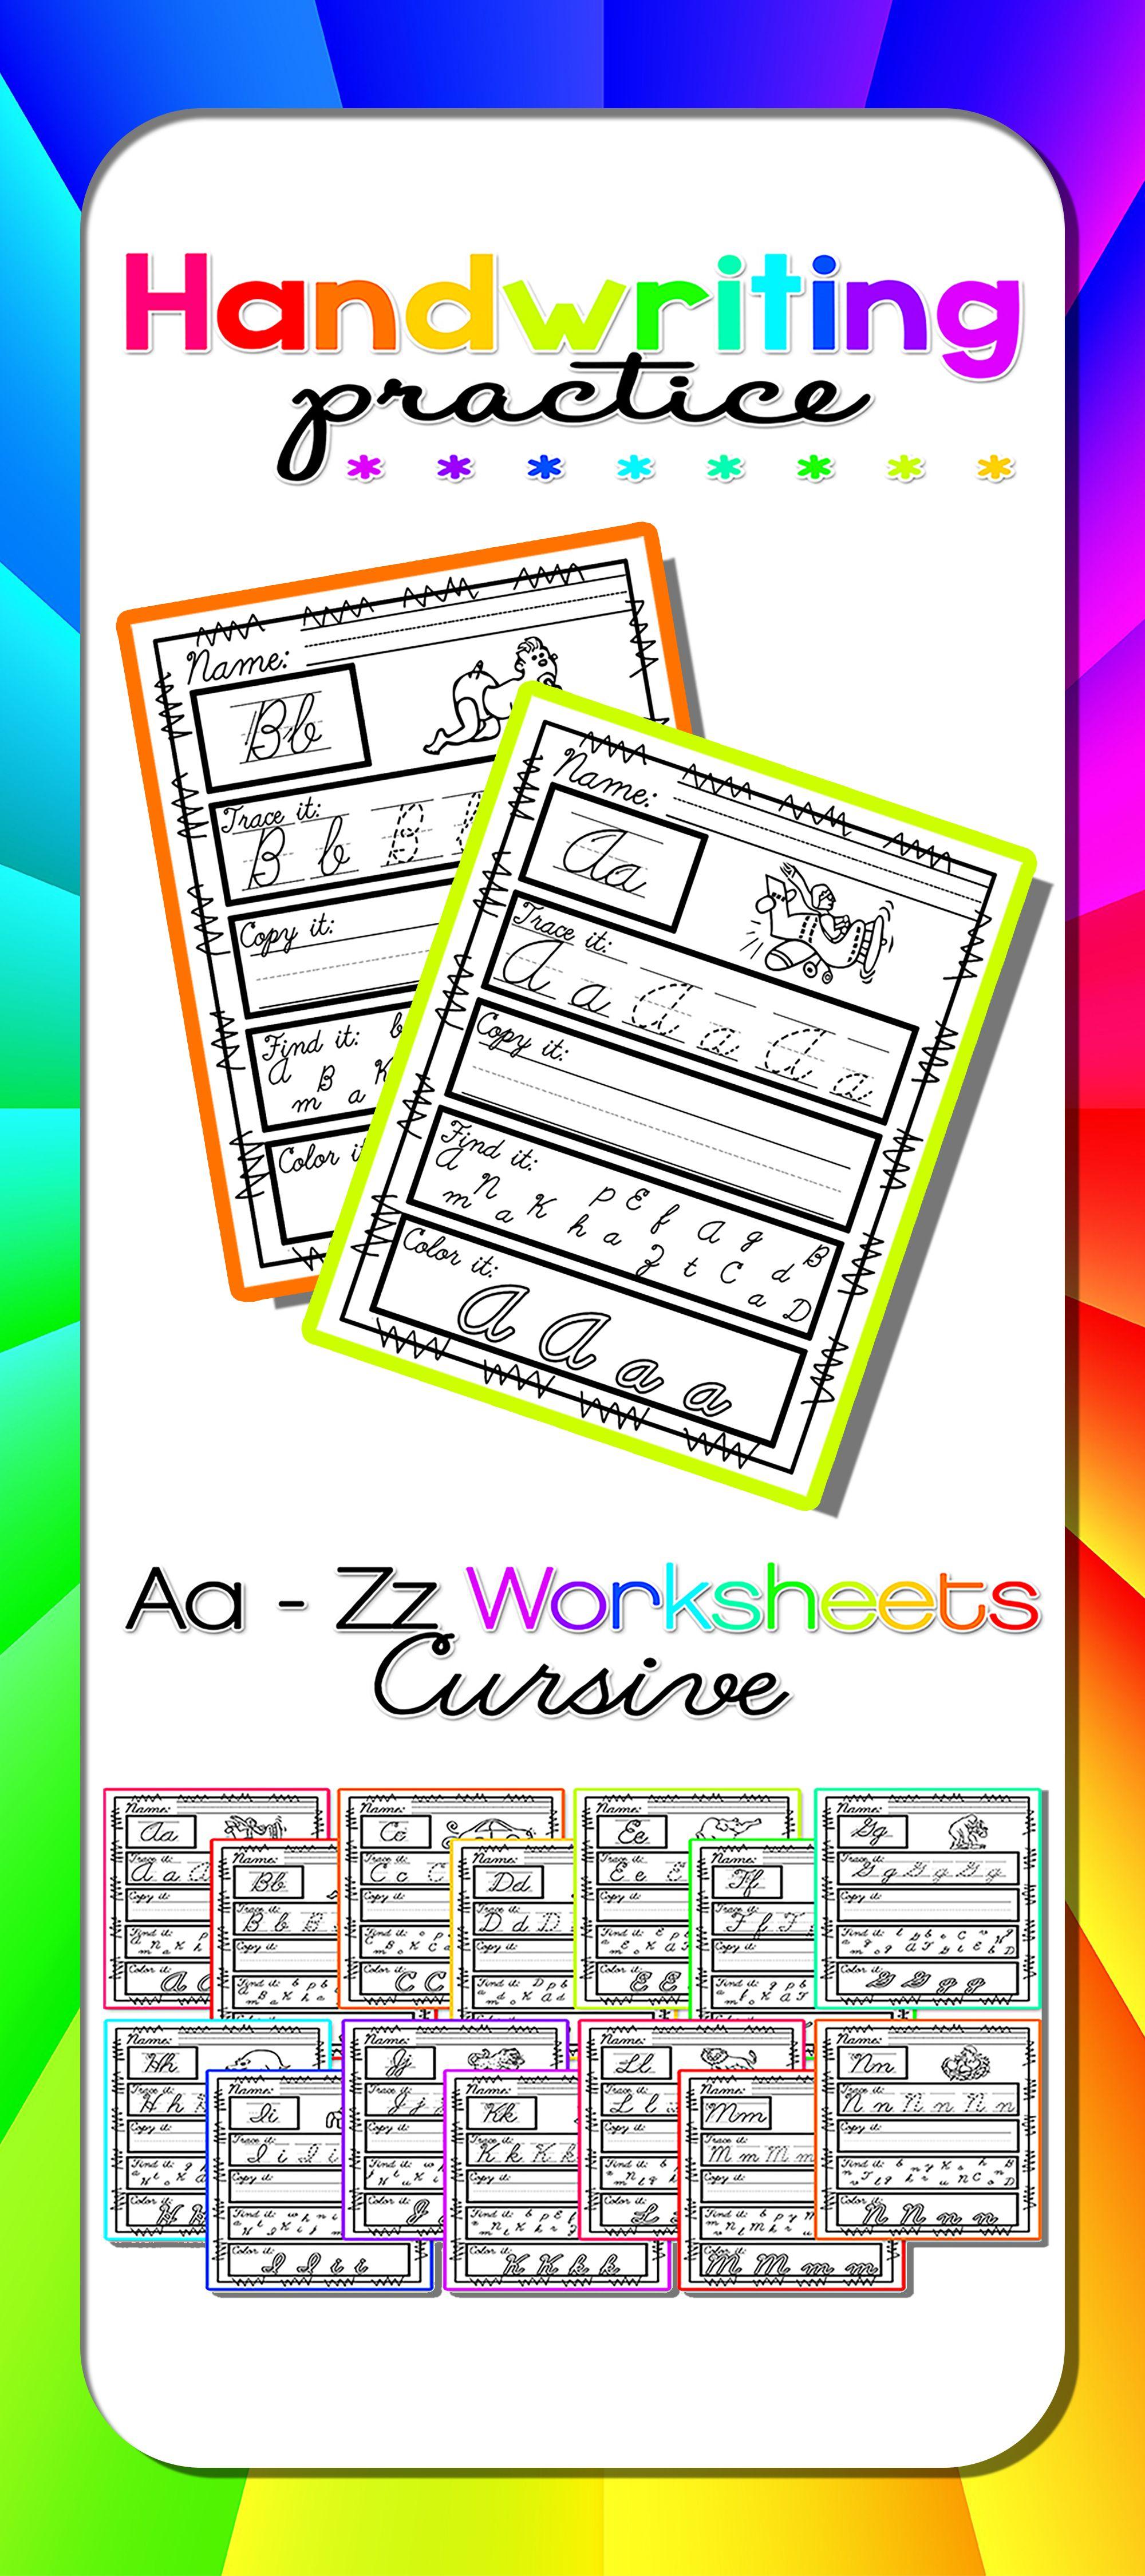 Worksheets For Cursive Handwriting Practice Emma Pinterest